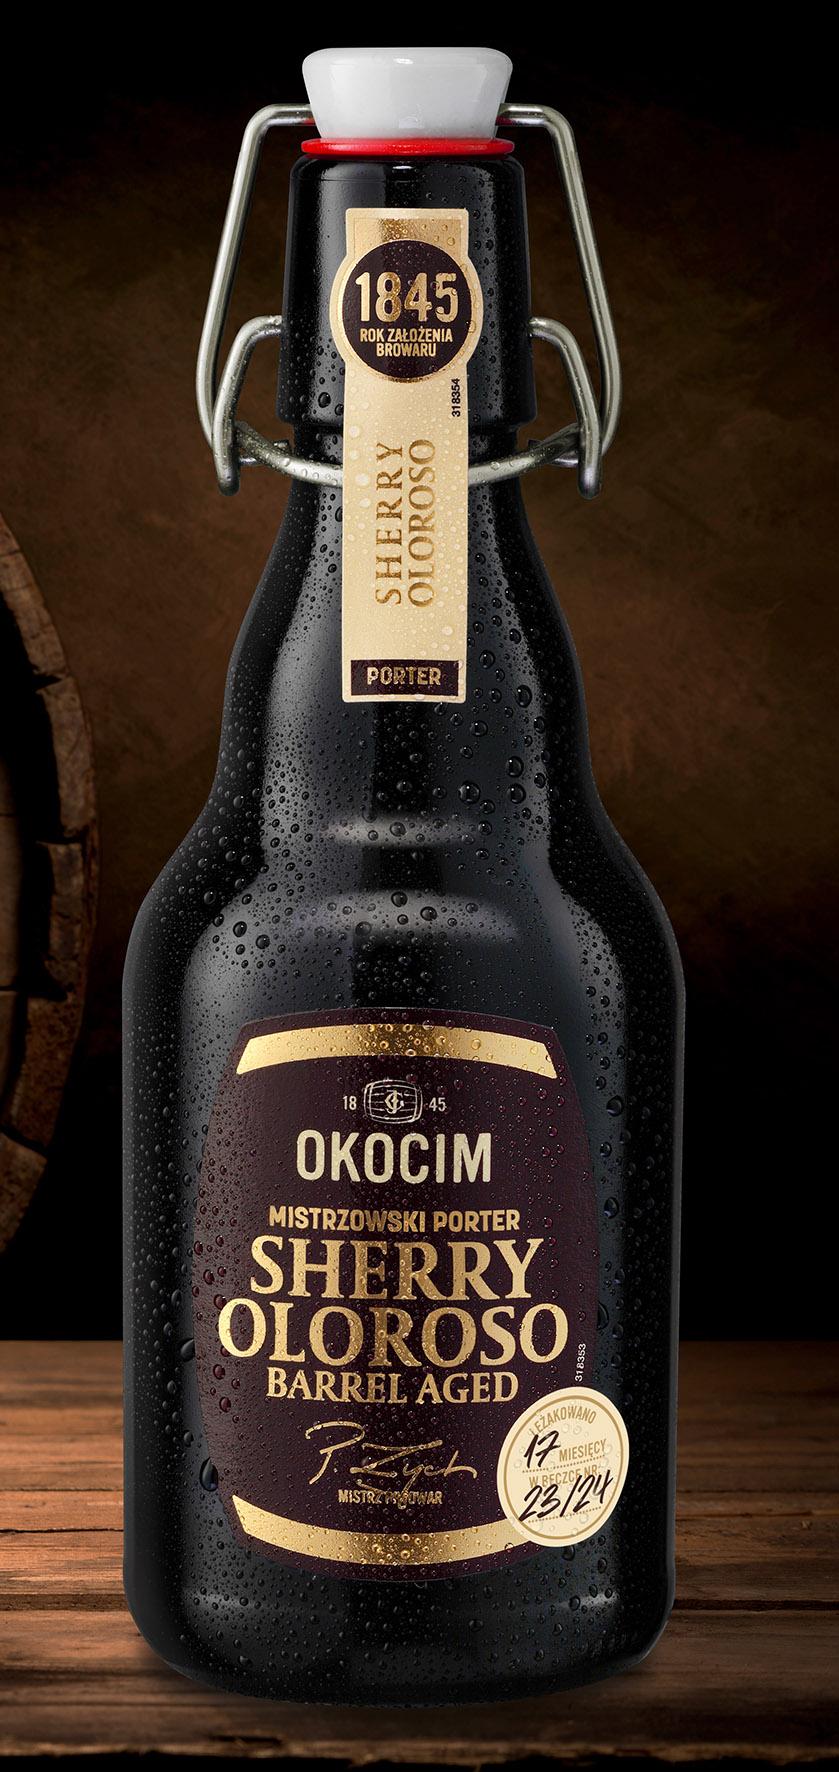 Mistrzowski Porter Sherry Oloroso Barrel Aged